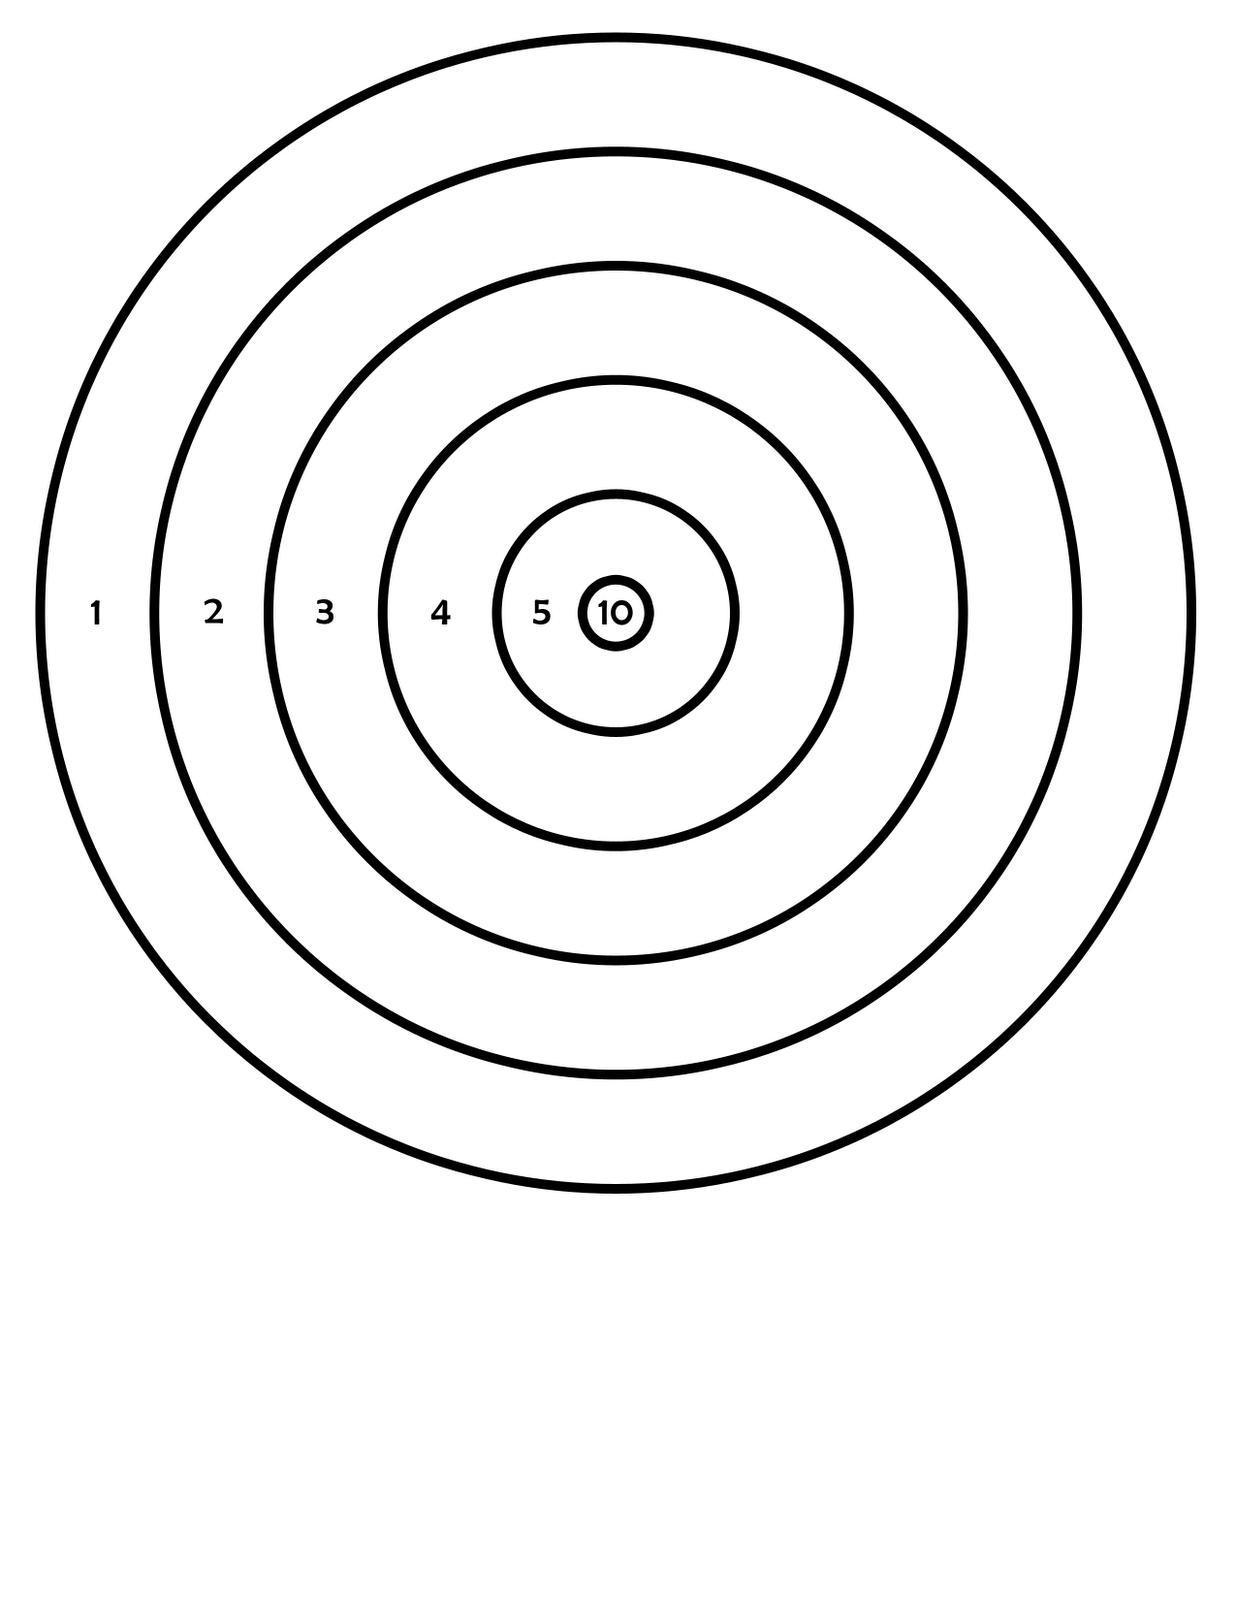 Printable Targets   411Toys: Free Printable Airsoft Targets - Free Printable Shooting Targets